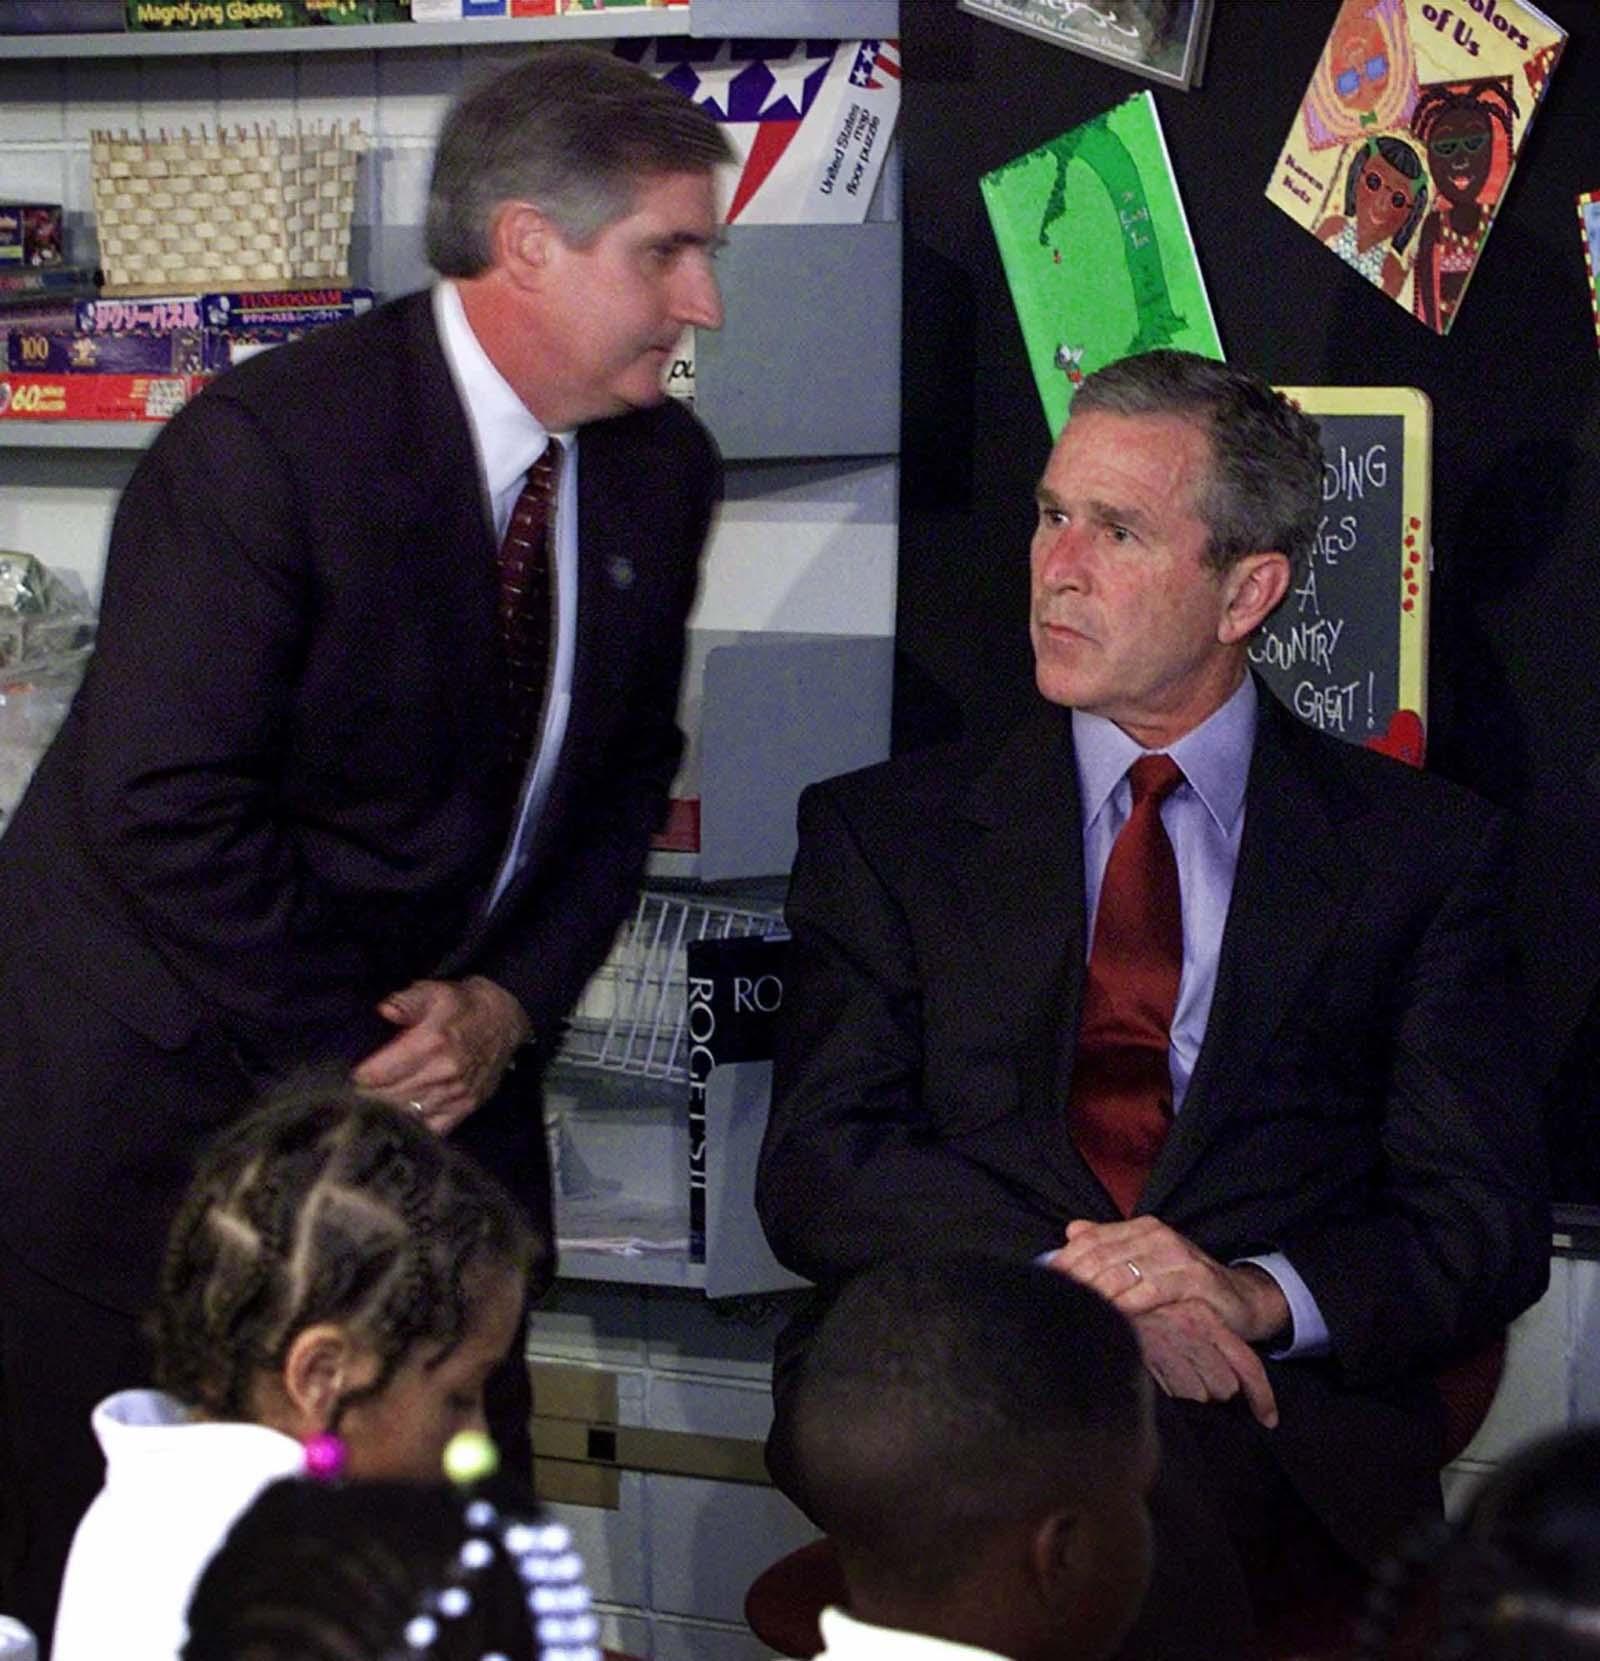 president bush informed 9-11 attack photo